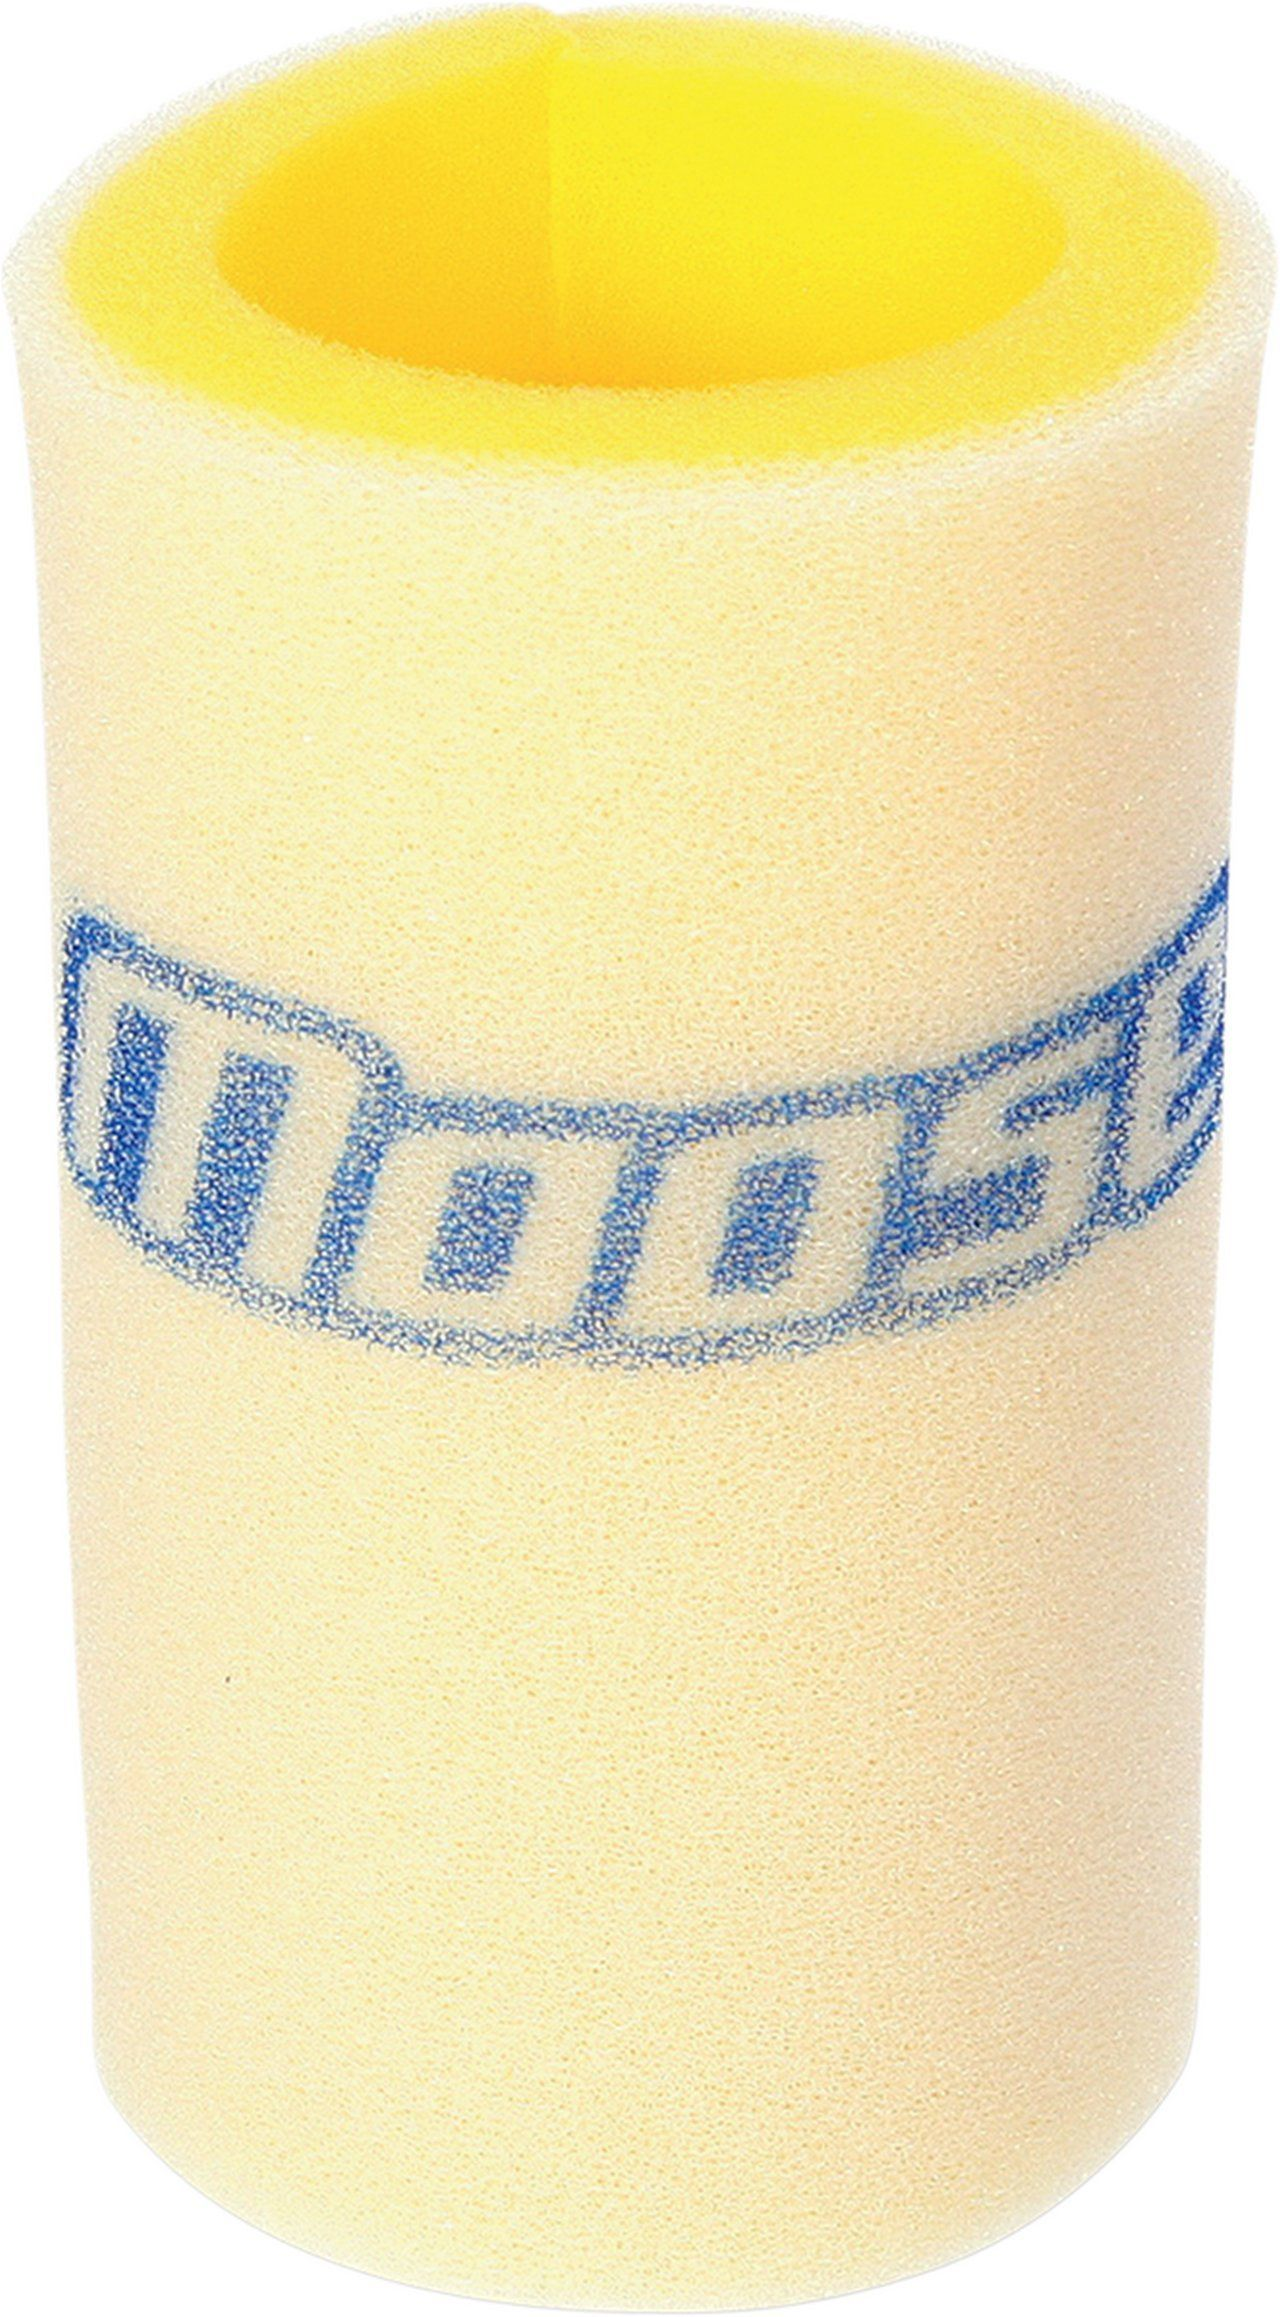 【MOOSE RACING】PPO (PRECISION PRE-OILED) 空氣濾芯 [M763-20-04] - 「Webike-摩托百貨」